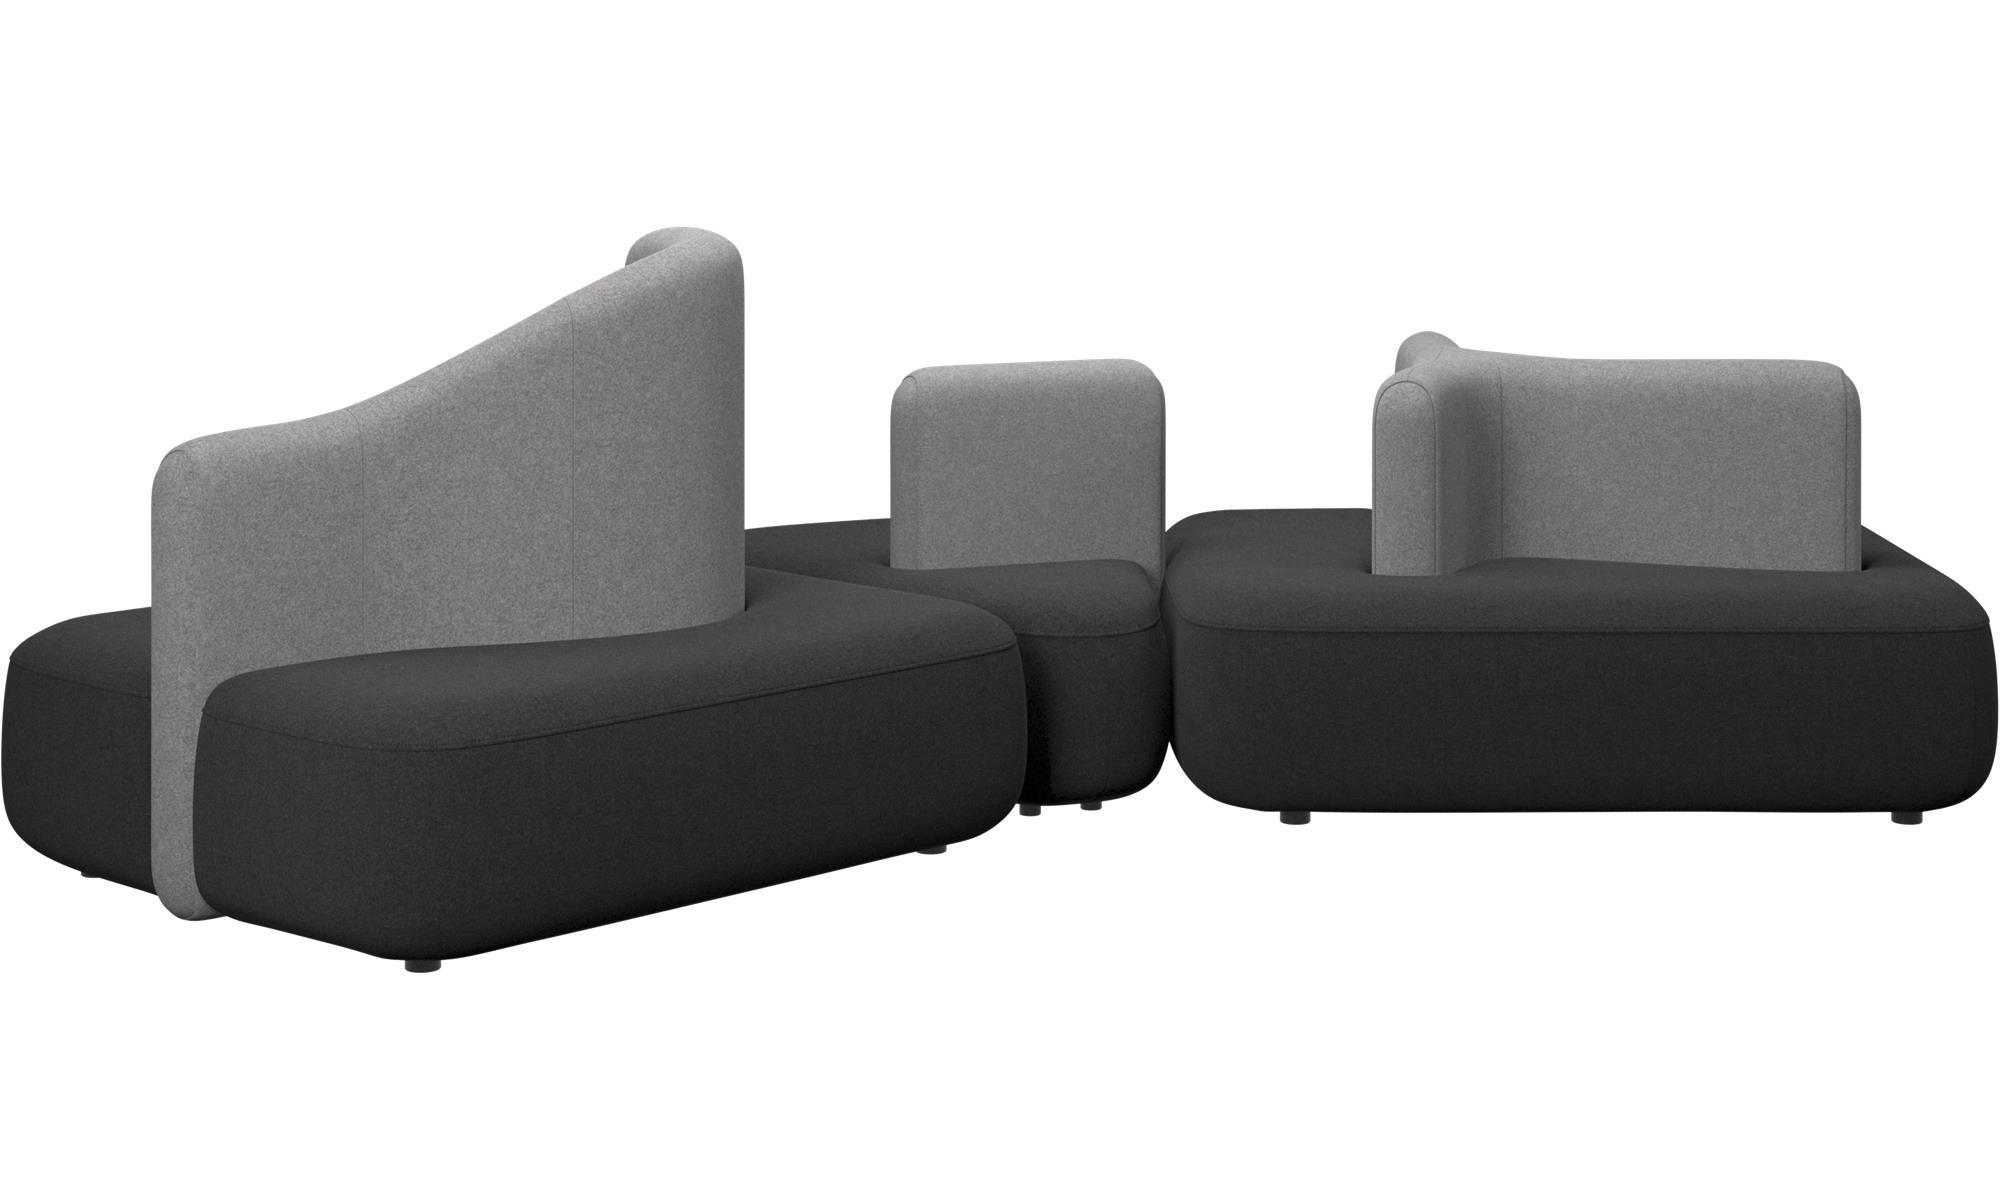 Sofa ottawa modular sofas ottawa sofa boconcept thesofa for Sectional sofas ottawa